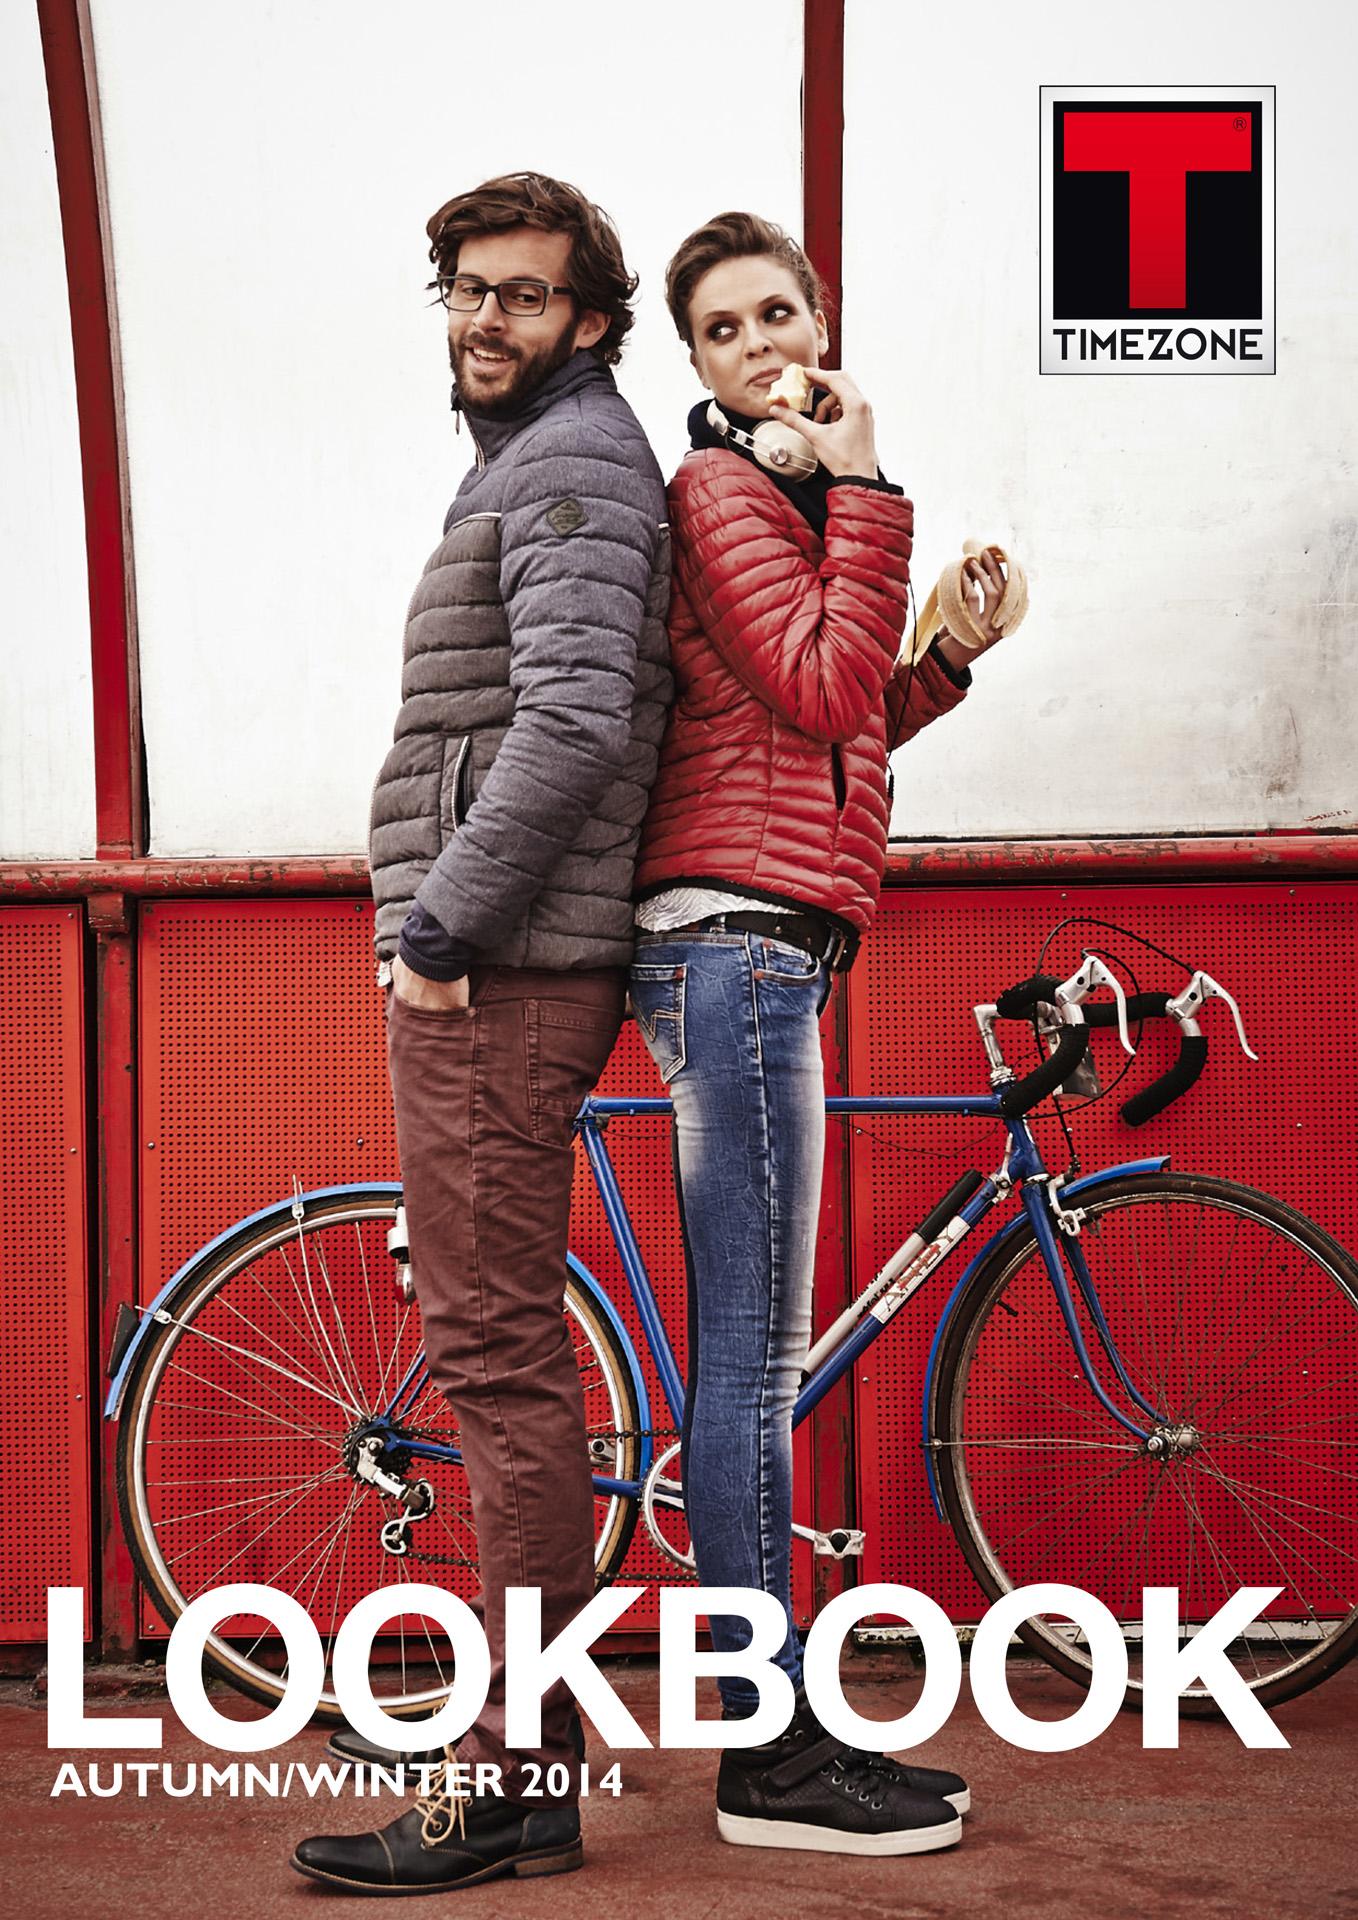 LOOKBOOK AW 14